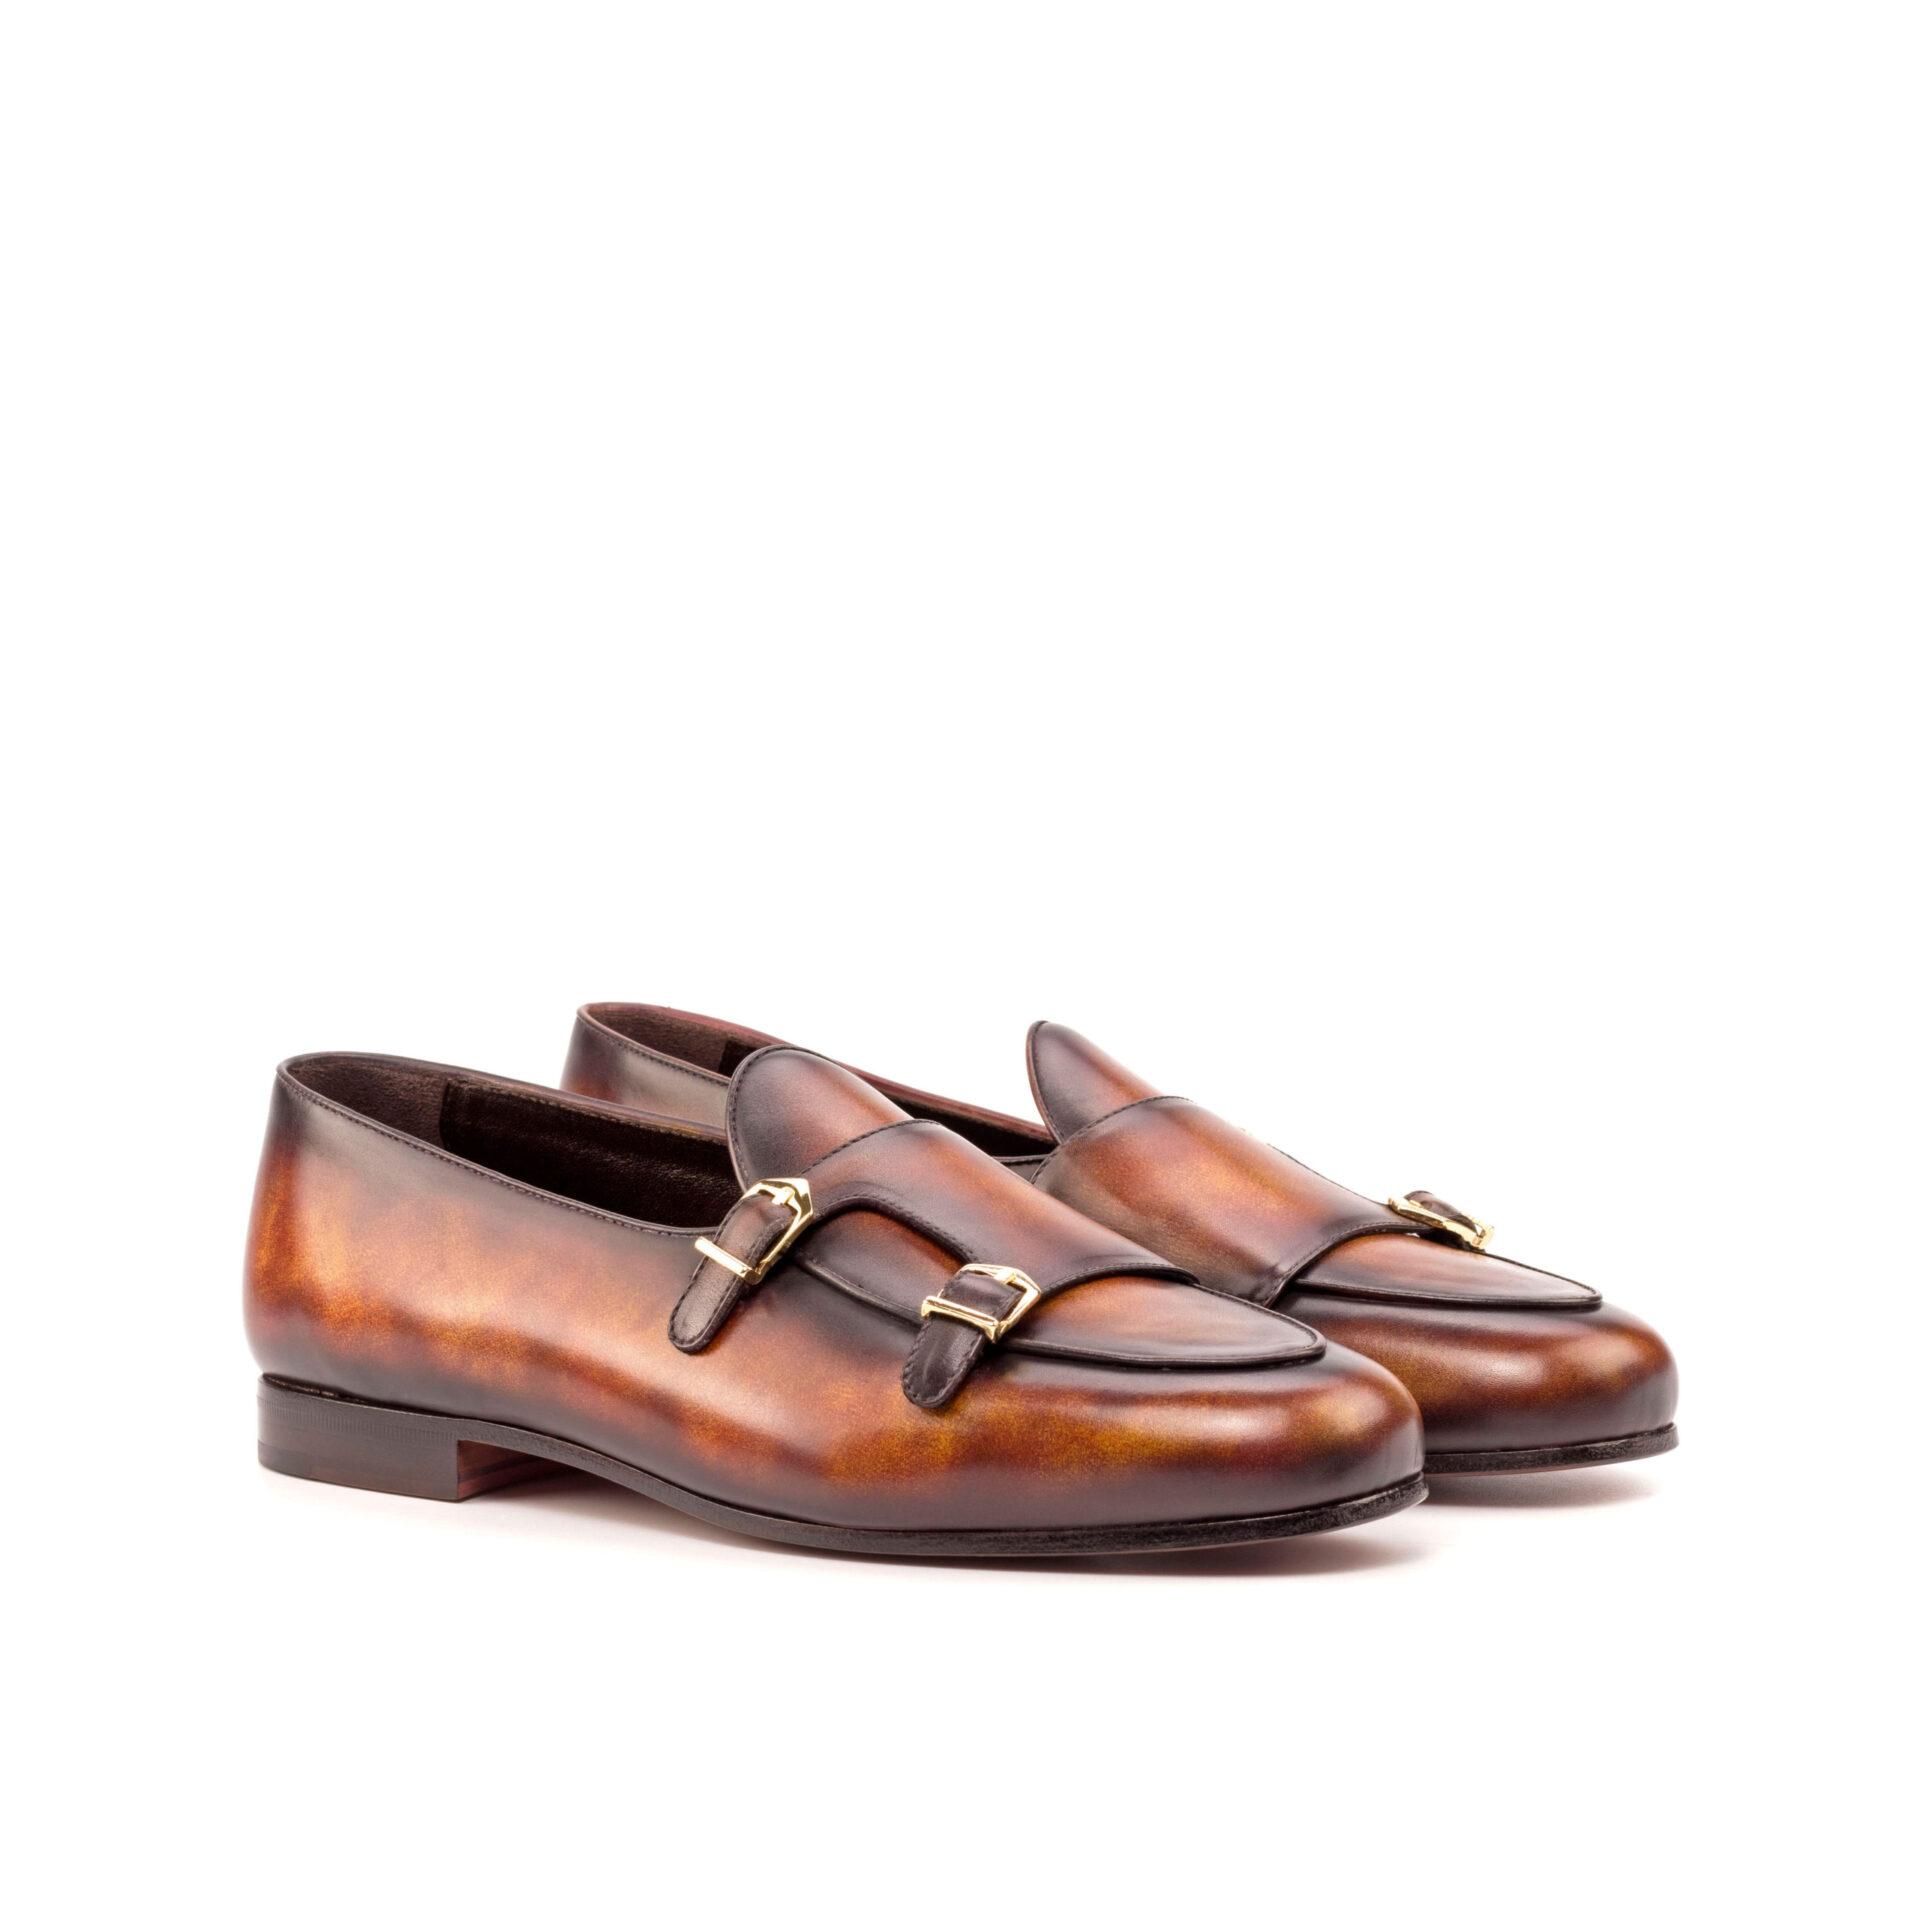 Handmade Patina Monk Slipper Shoe